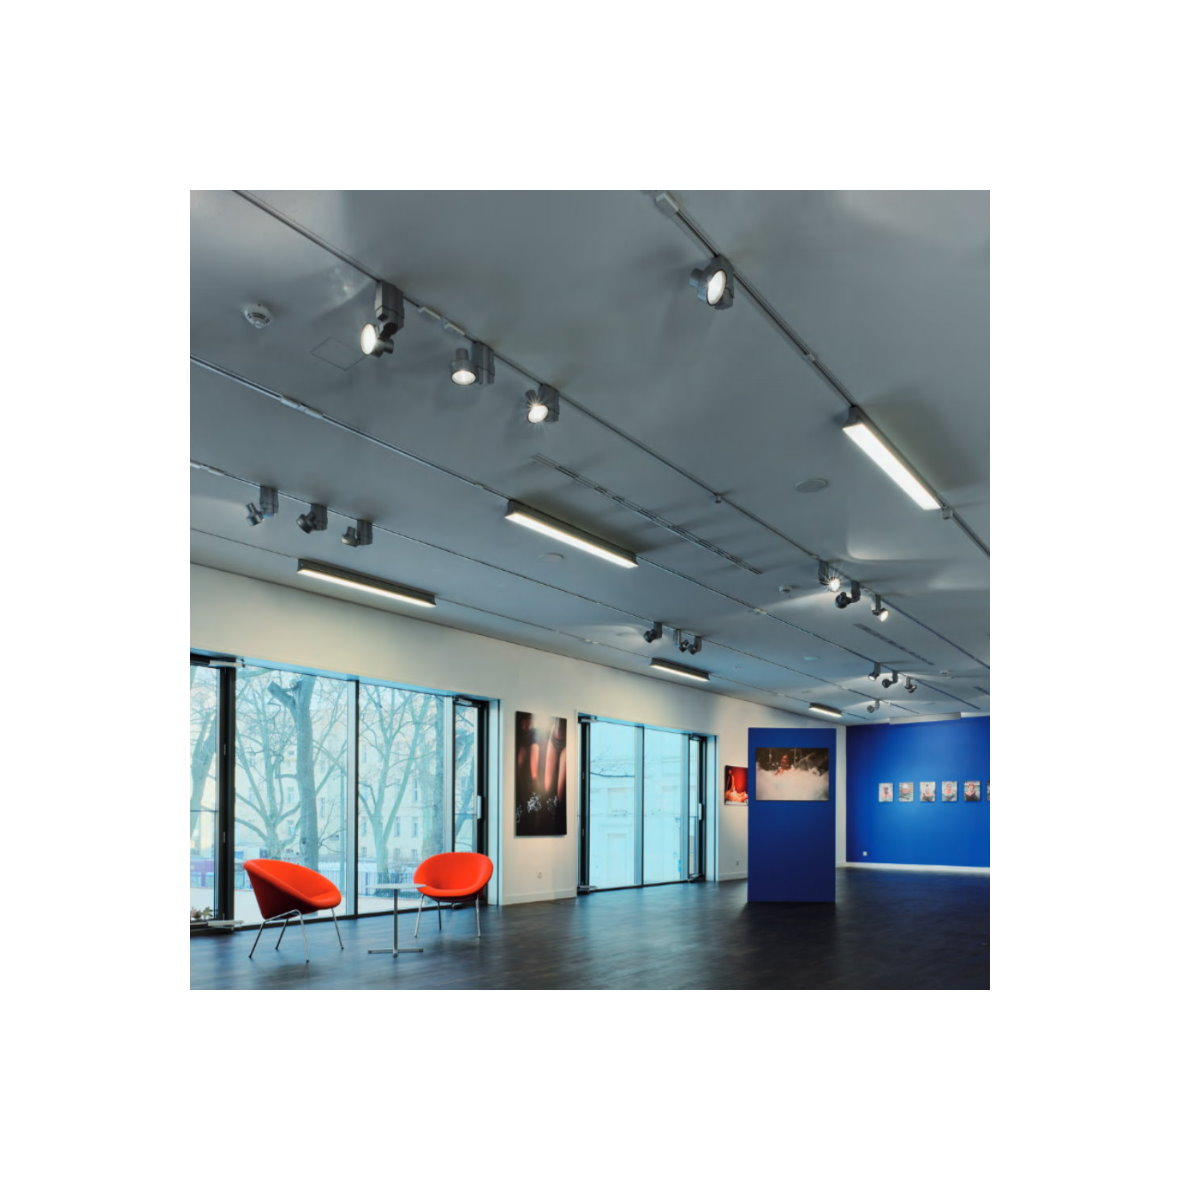 29 9 m eutrac 3 phasen stromschiene 230v strom schiene alu profil phase ebay. Black Bedroom Furniture Sets. Home Design Ideas